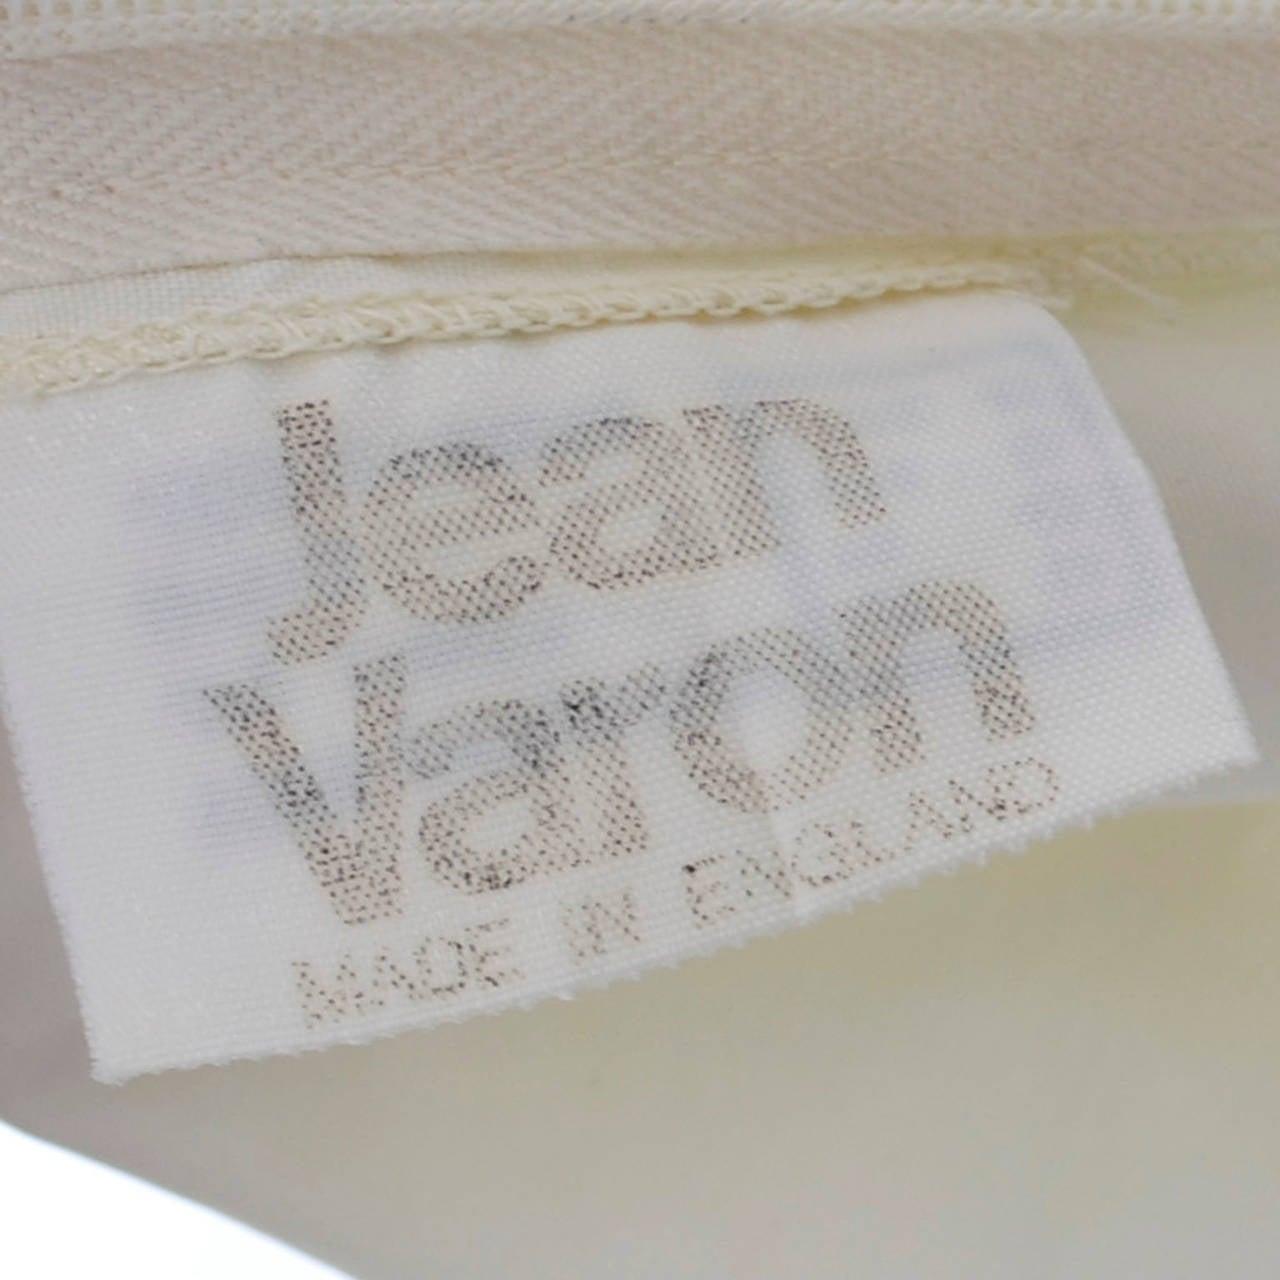 1970s Vintage Jean Varon John Bates Chiffon Designer Dress Batwing Sleeves For Sale 5